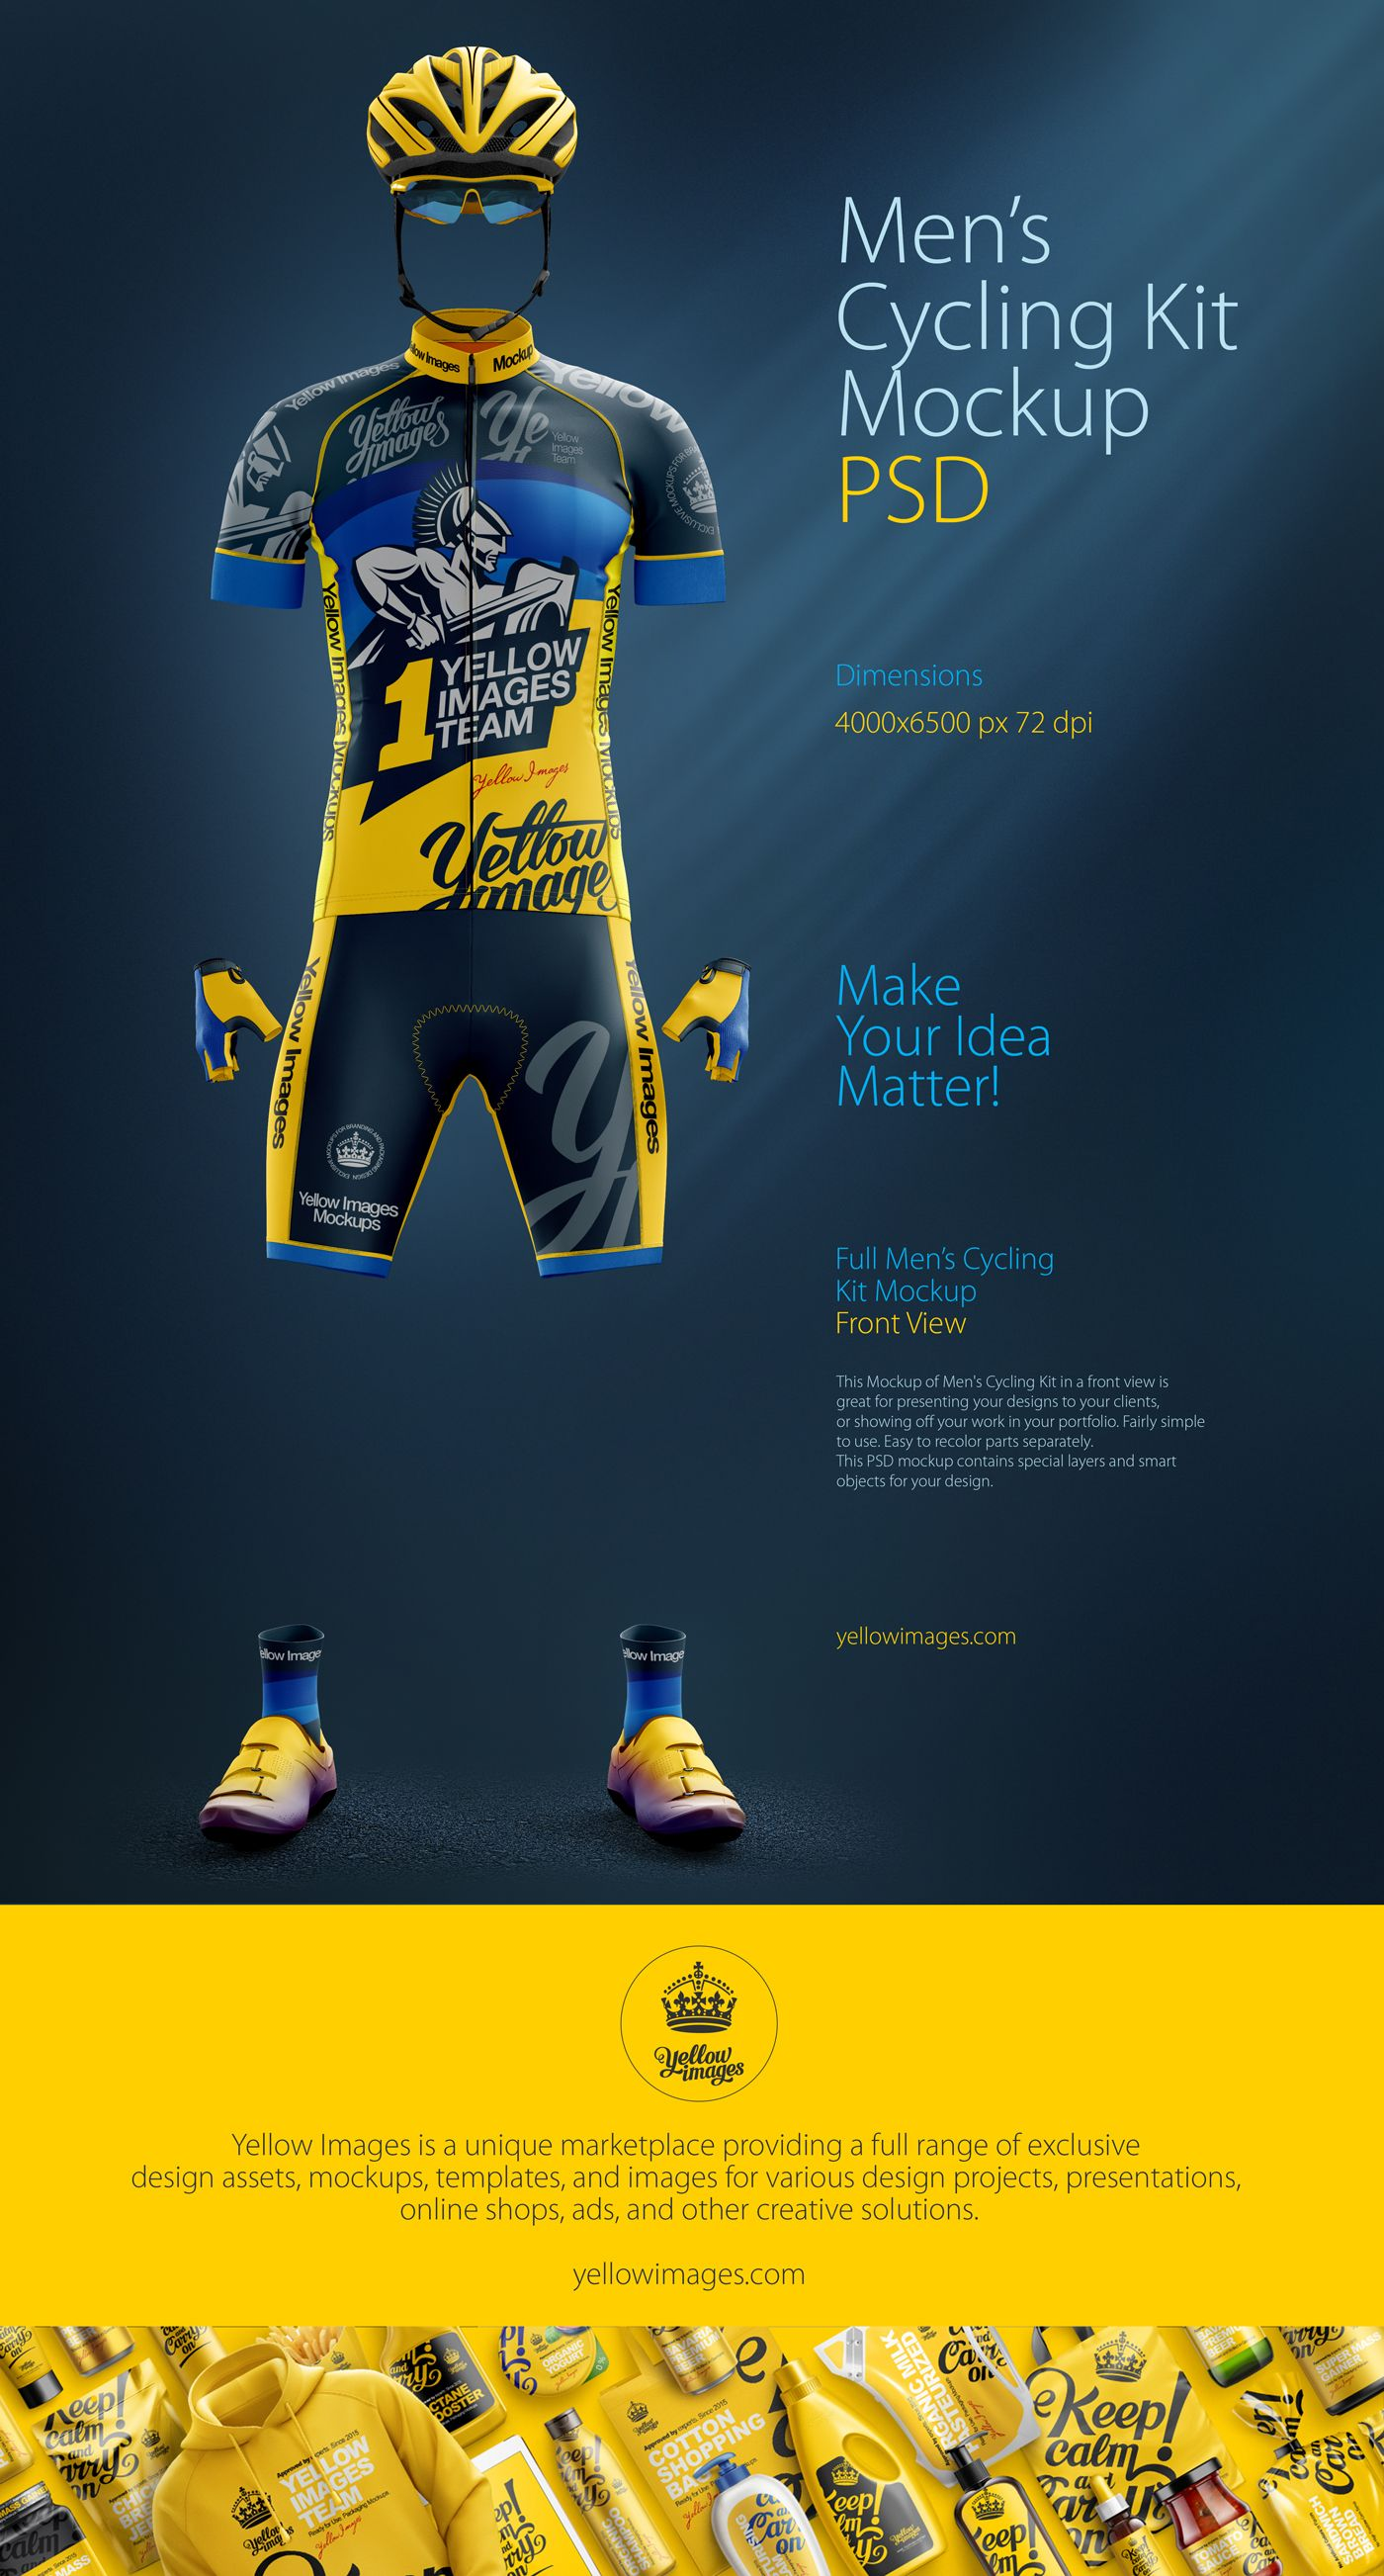 Pin De Pawellpi Design Em Mockup Yellow Images Com Imagens Mockup Camiseta Mockup Camisa